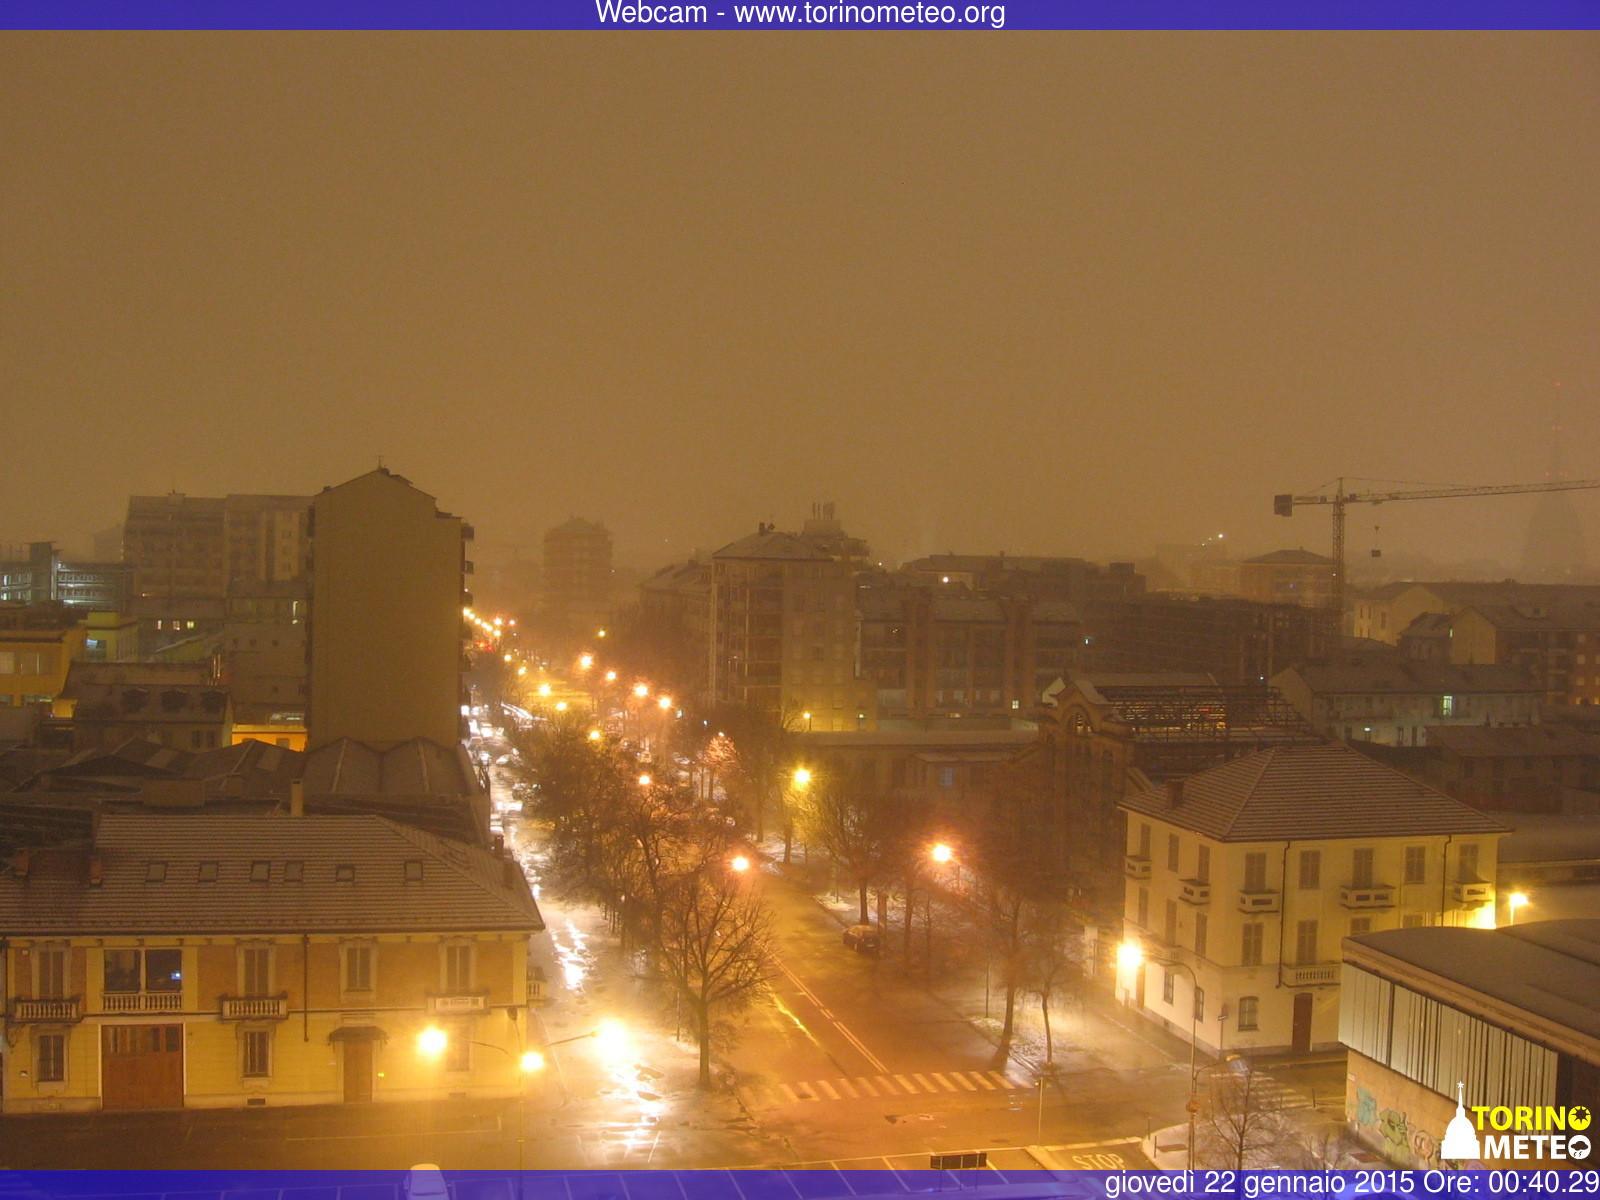 Torino capitola a neve - www.torinometeo.org